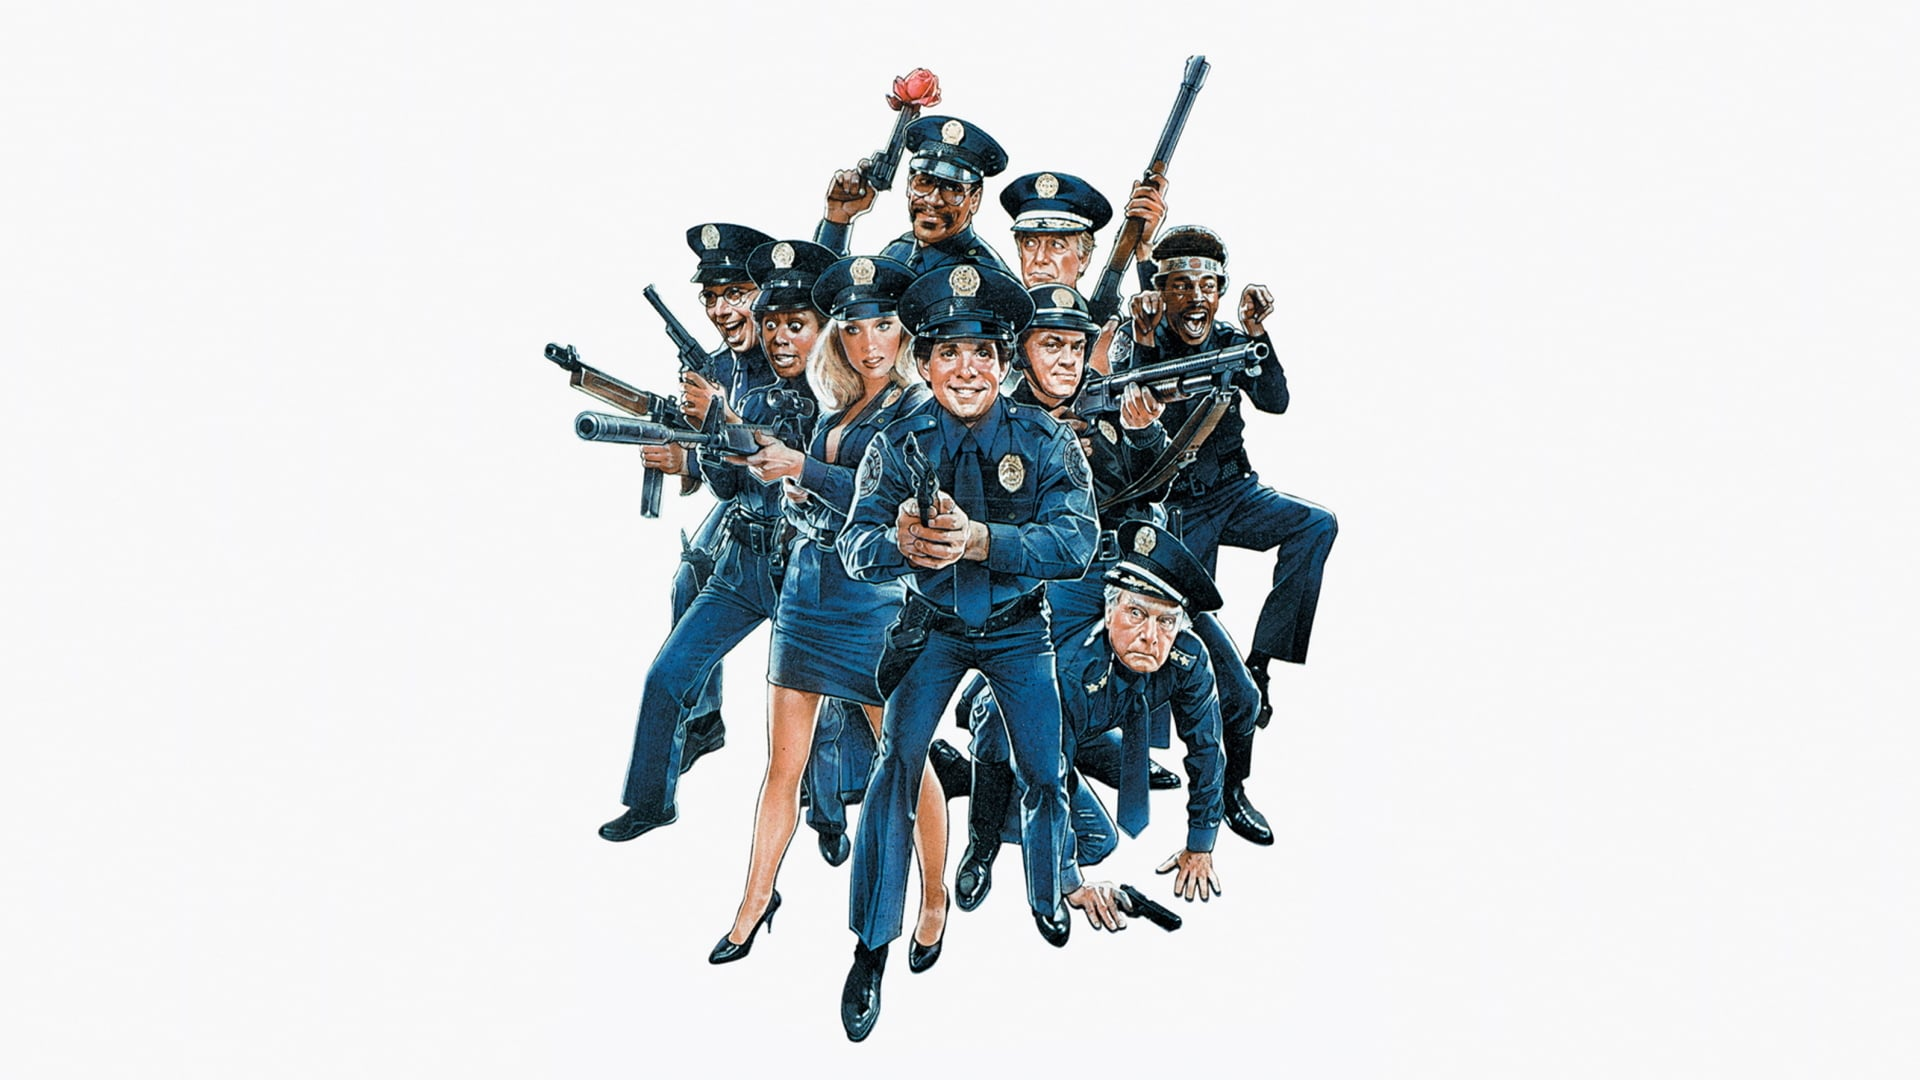 Regarder Police Academy 2 : Au boulot ! en streaming gratuit